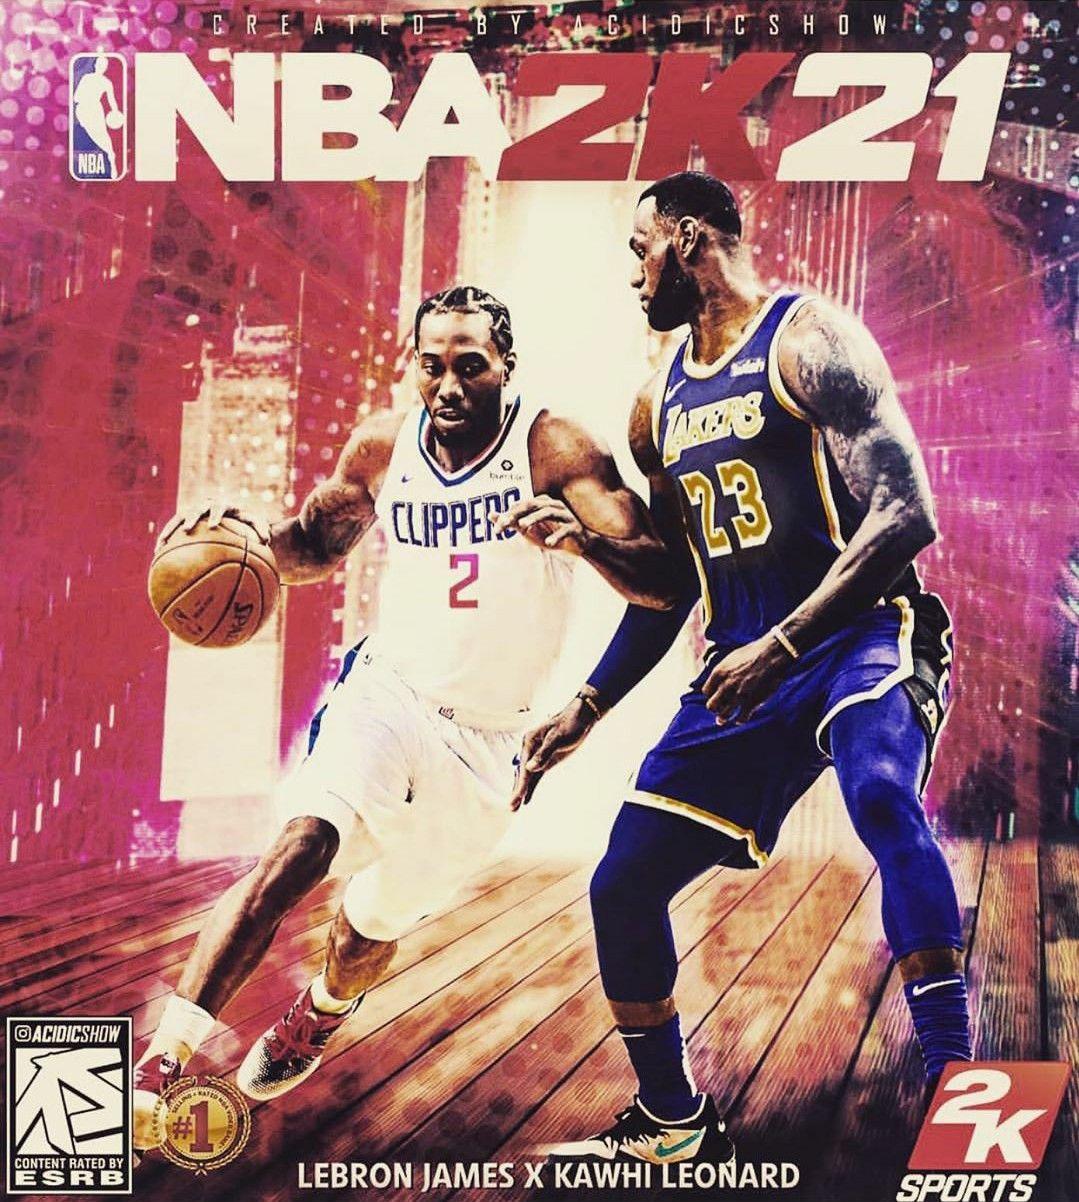 Pin By Palina Rojiski On Nba Nba Video Games Lakers Vs Lakers Vs Clippers